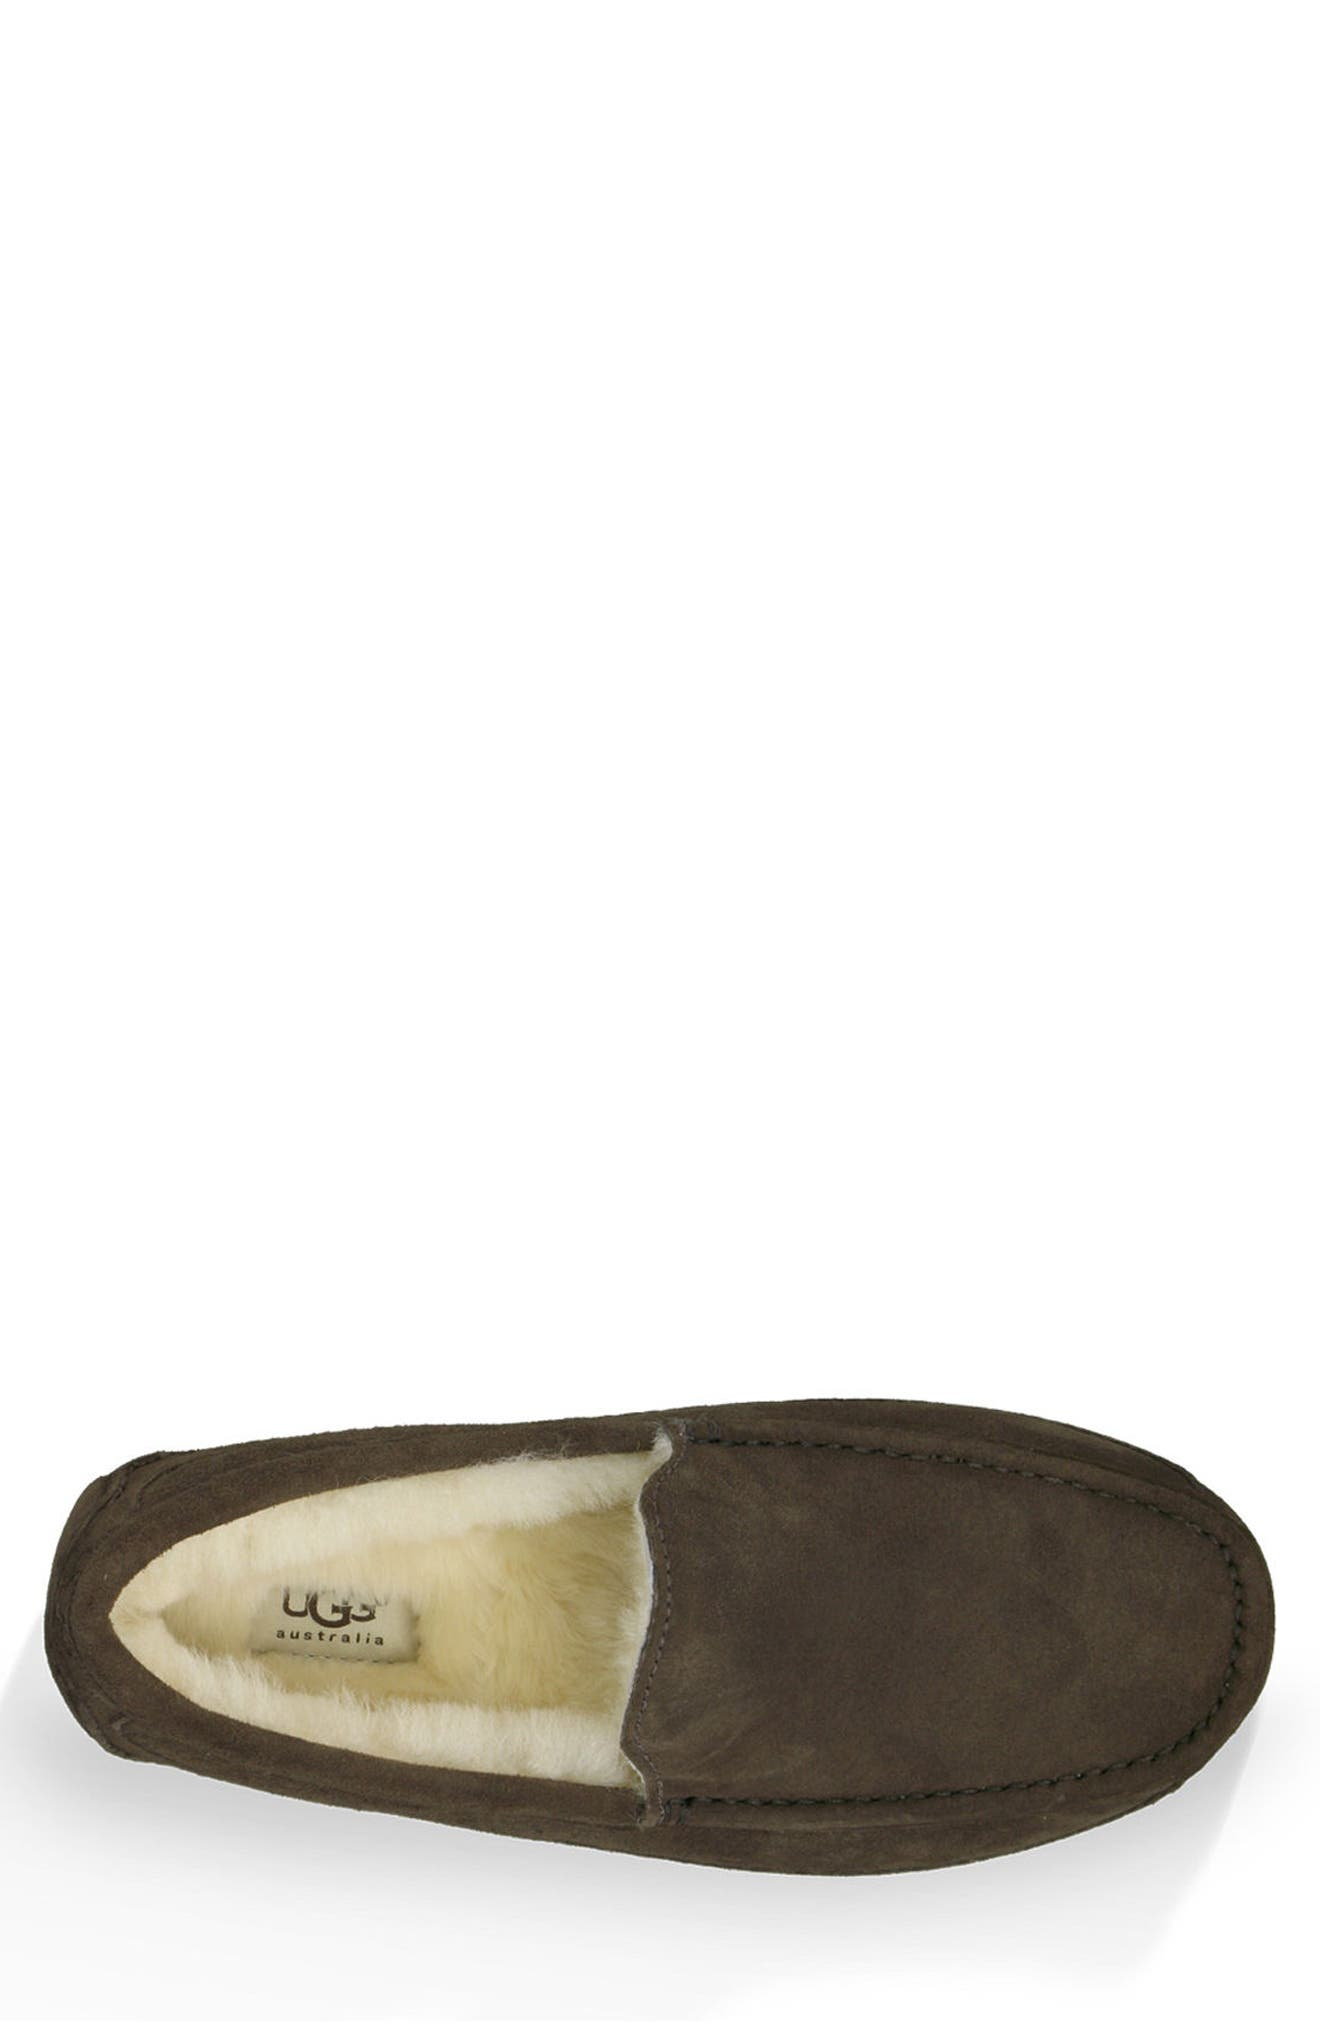 UGG<SUP>®</SUP>, Ascot Slipper, Alternate thumbnail 4, color, ESPRESSO SUEDE